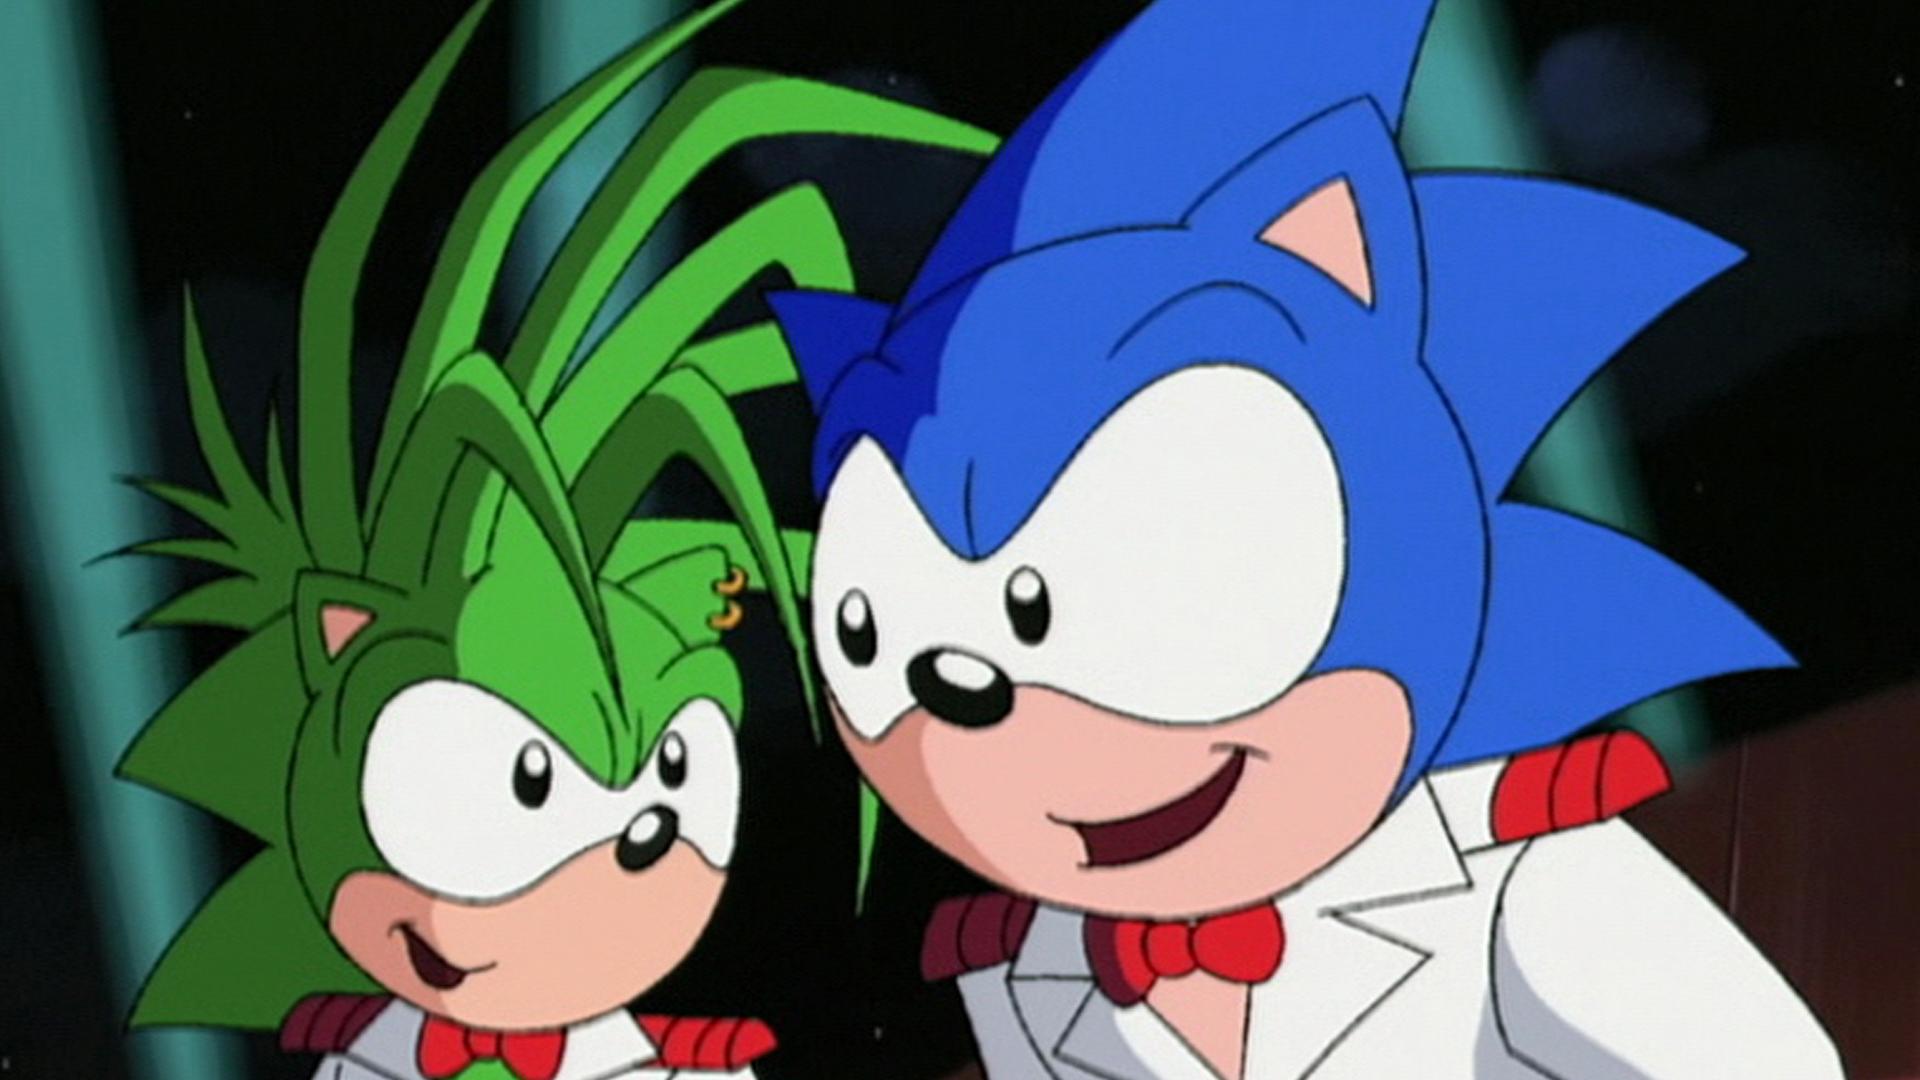 Watch Sonic Underground Season 1 Episode 18 Artifact Full Show On Cbs All Access